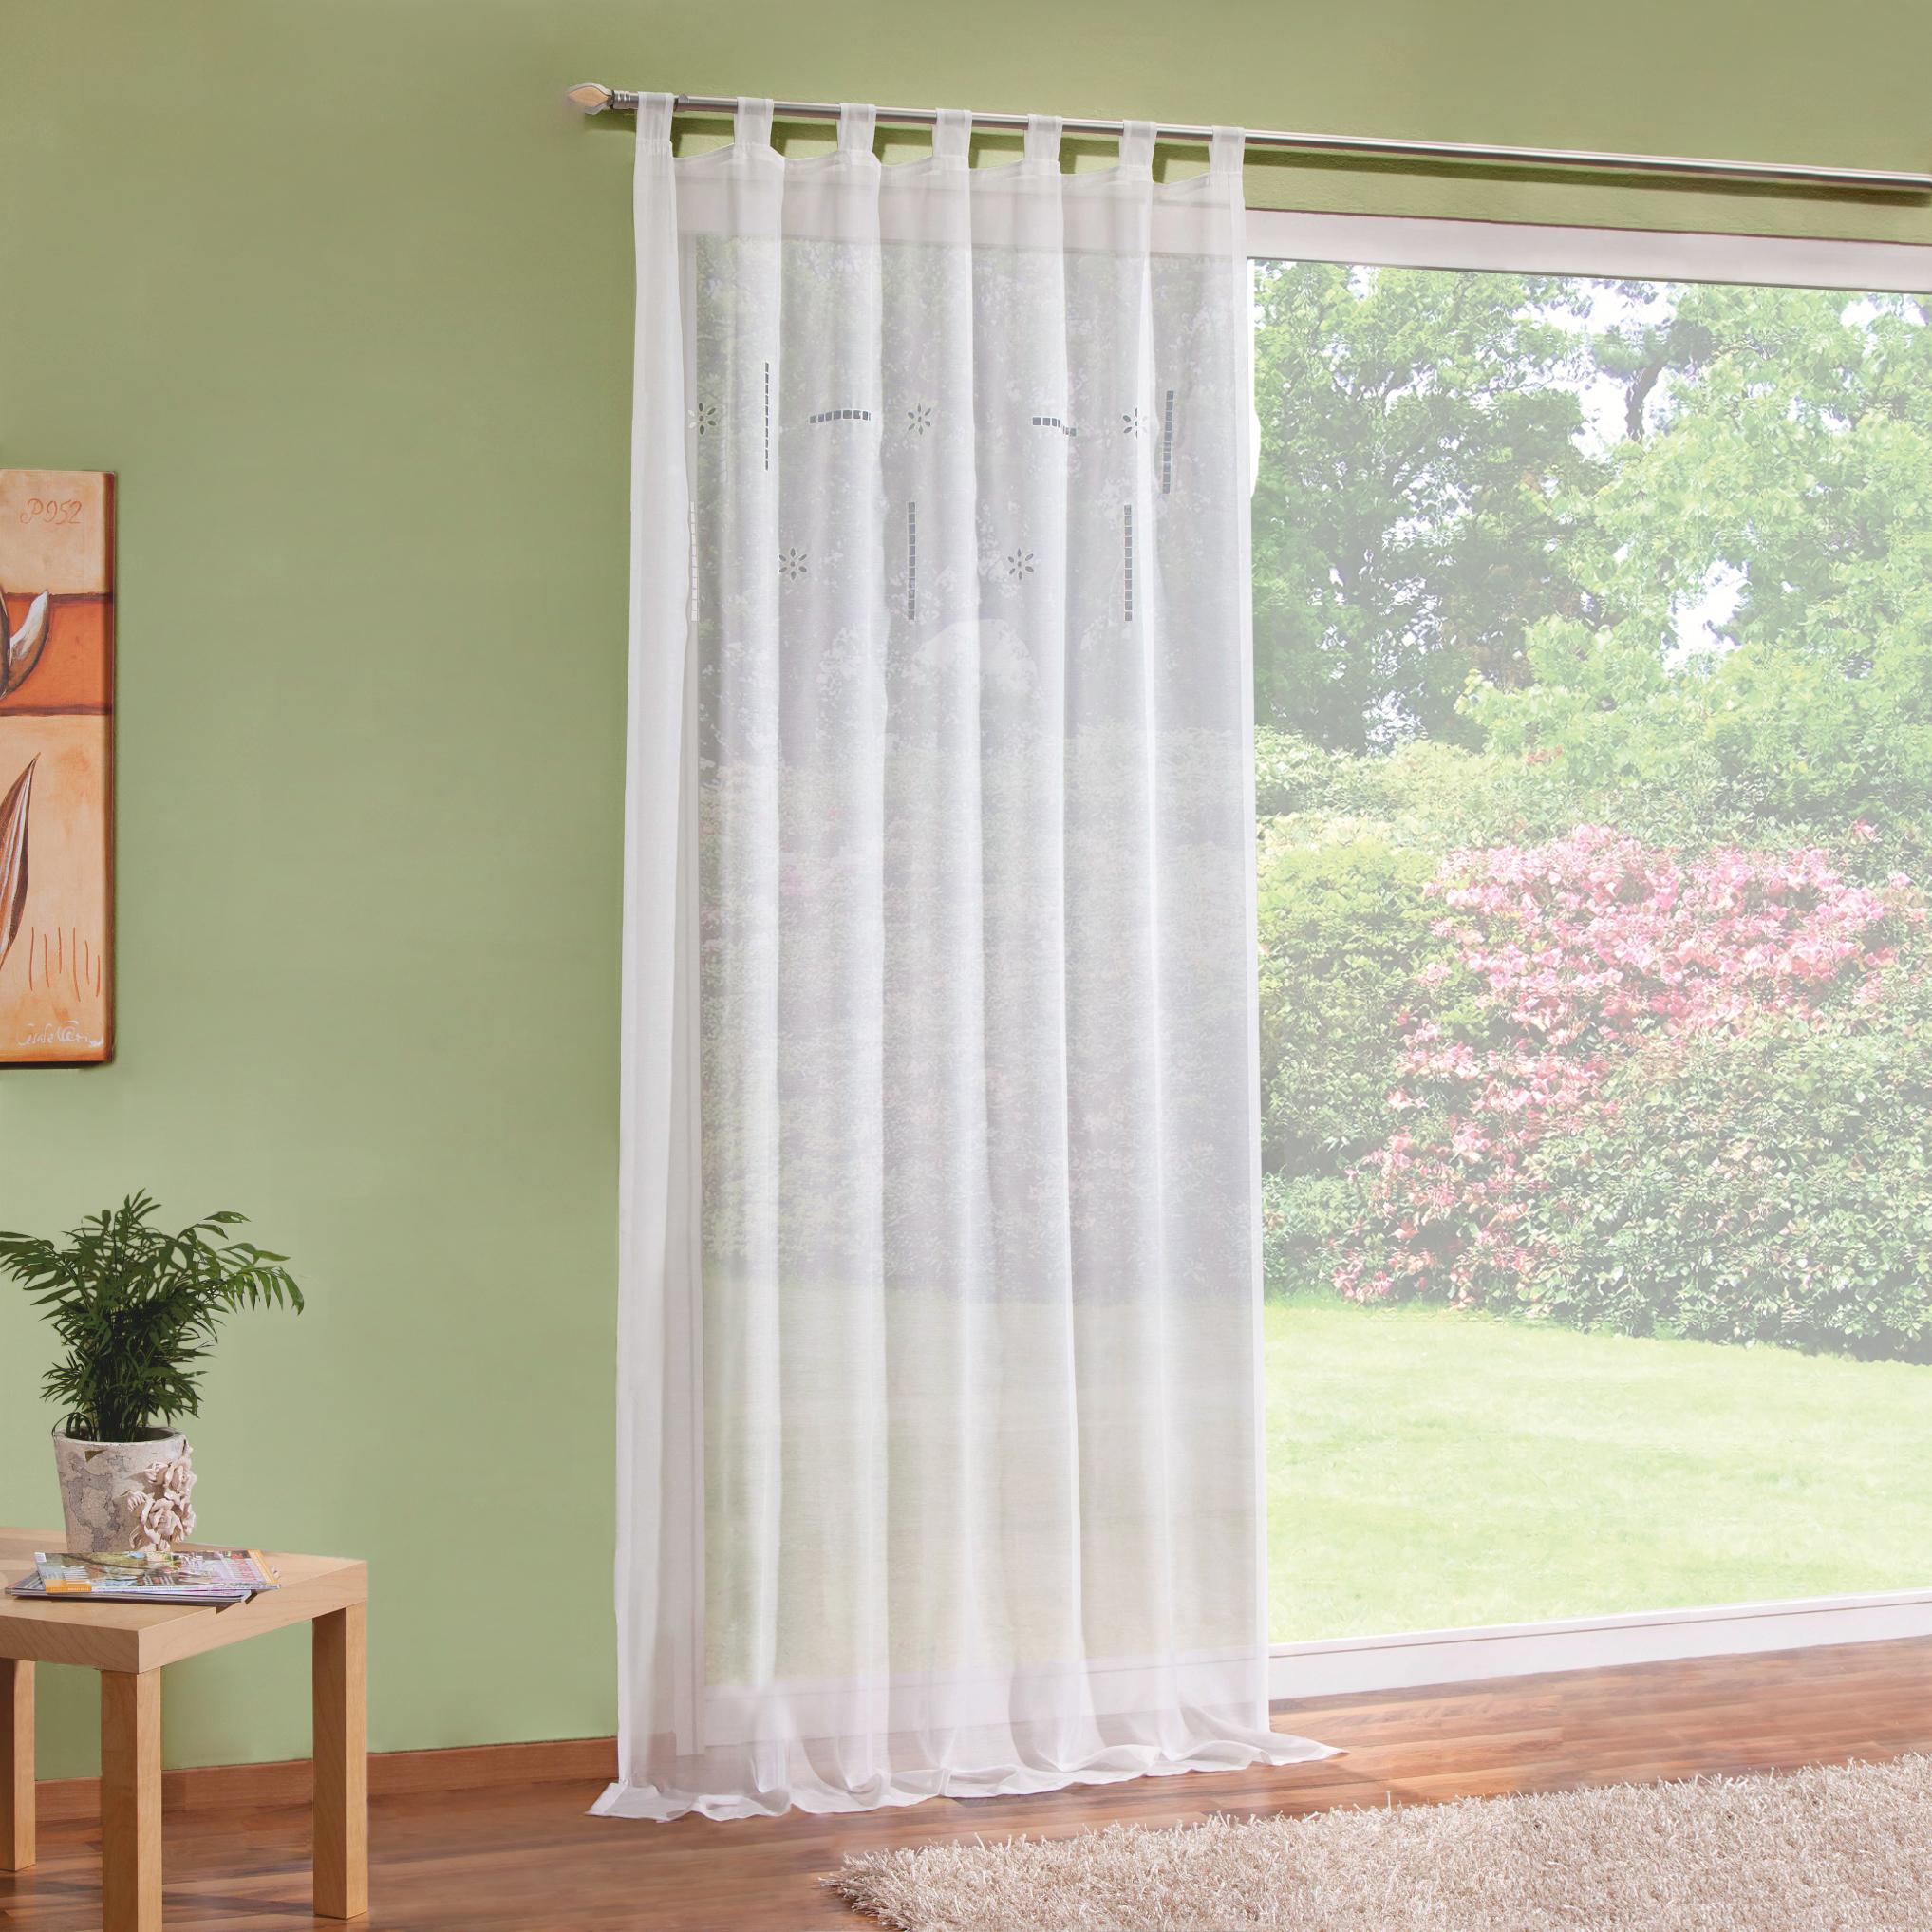 halbtransparente gardinen hcvc. Black Bedroom Furniture Sets. Home Design Ideas